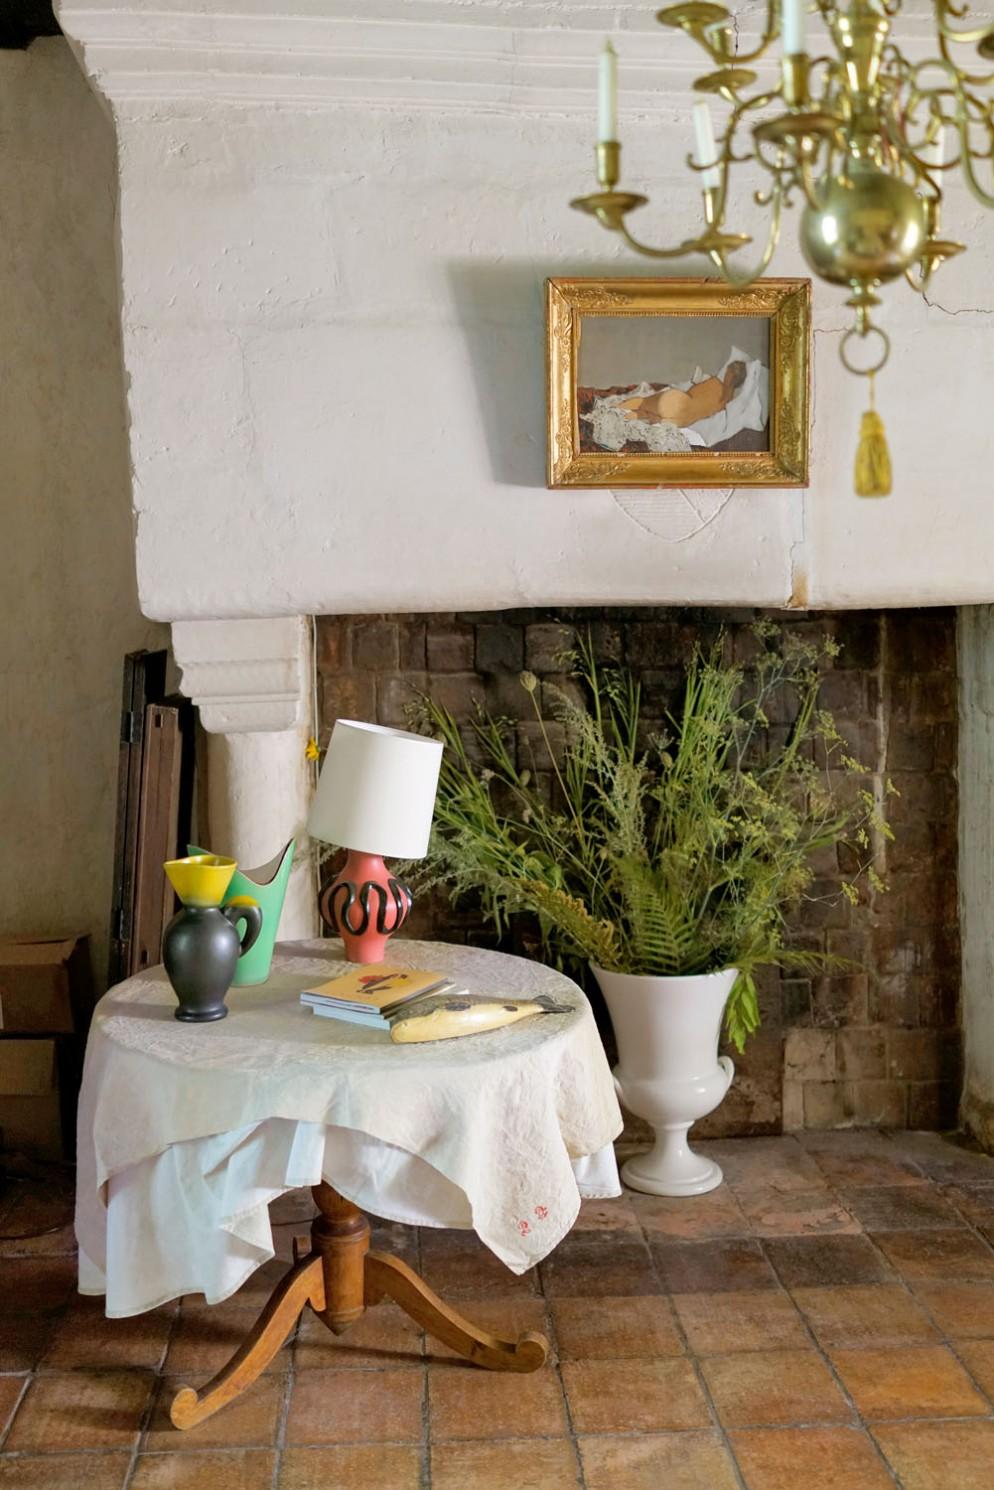 casa-del-ceramista-francese-pol-chambost-06